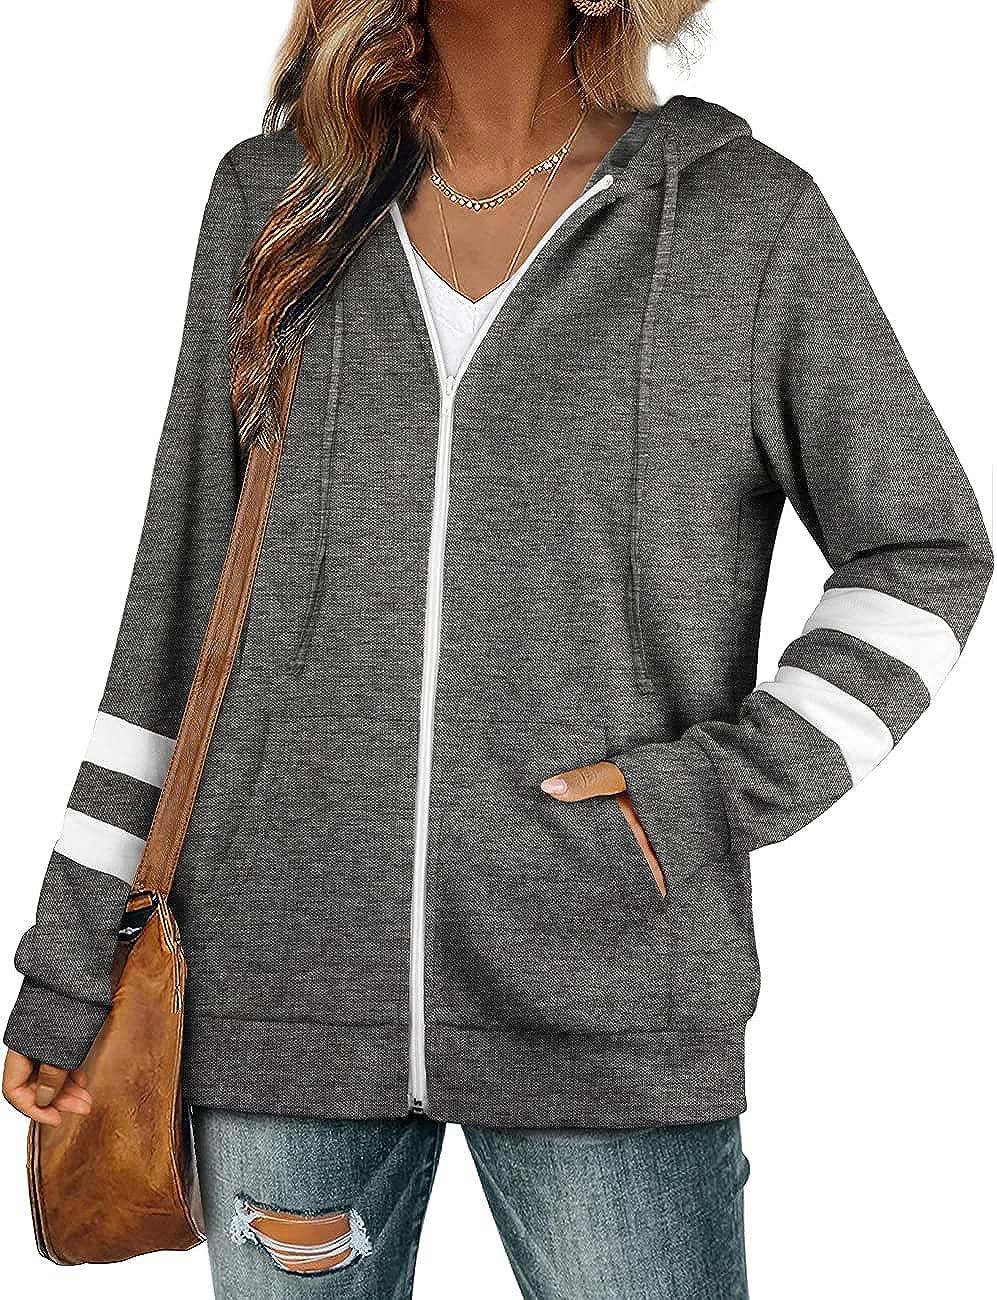 Bofell Womens Active Long Sleeve Zip Up Hoodies with Pocket Hooded Sweatshirts